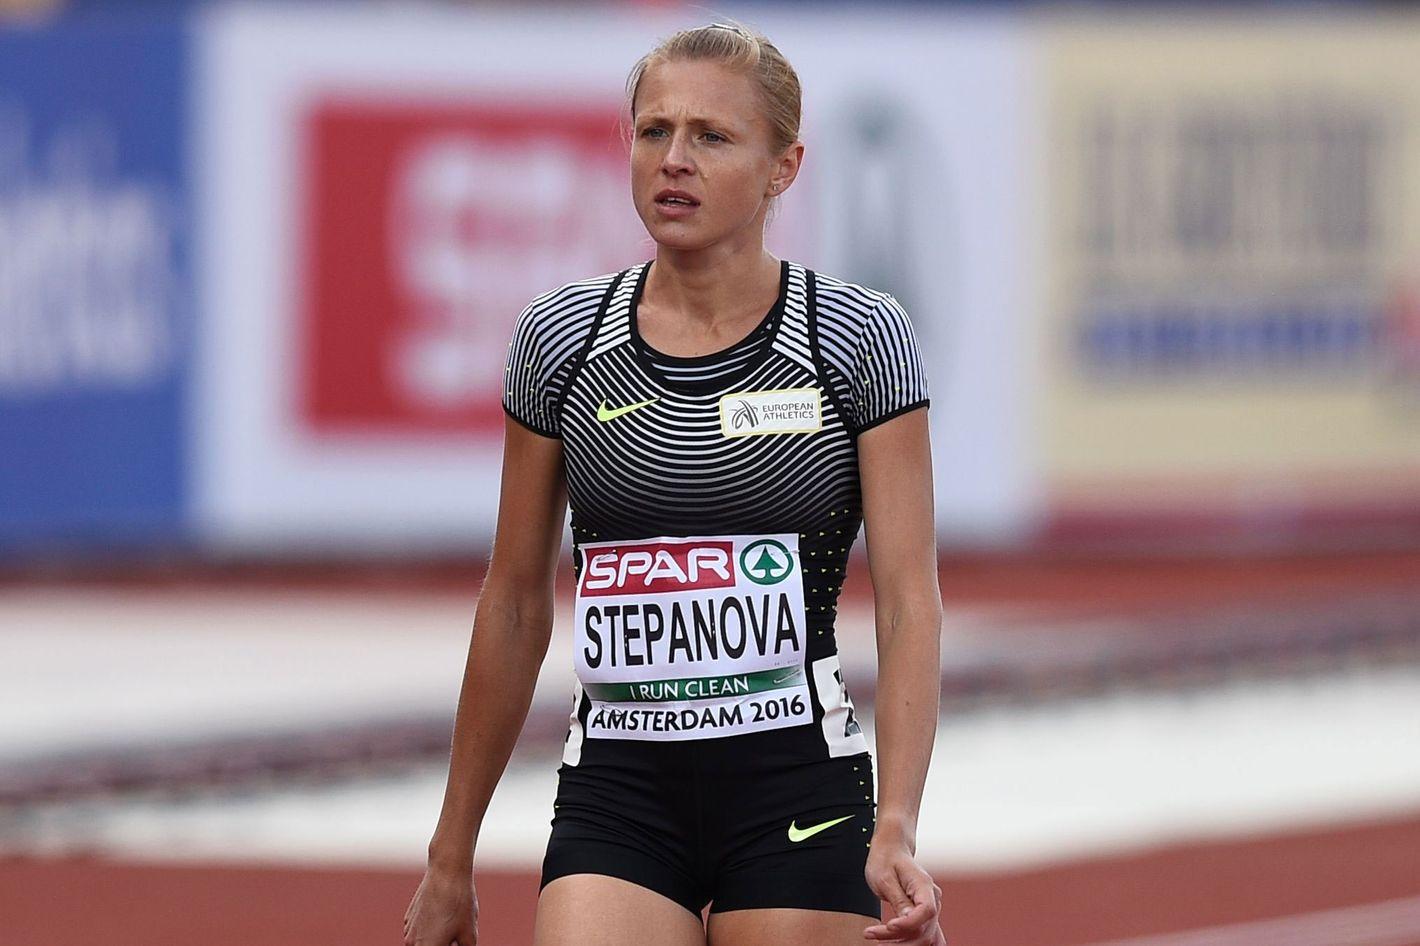 Watch Irina Press sprint runner, 2x Olympic champion (80-m hurdles pentathlon) video